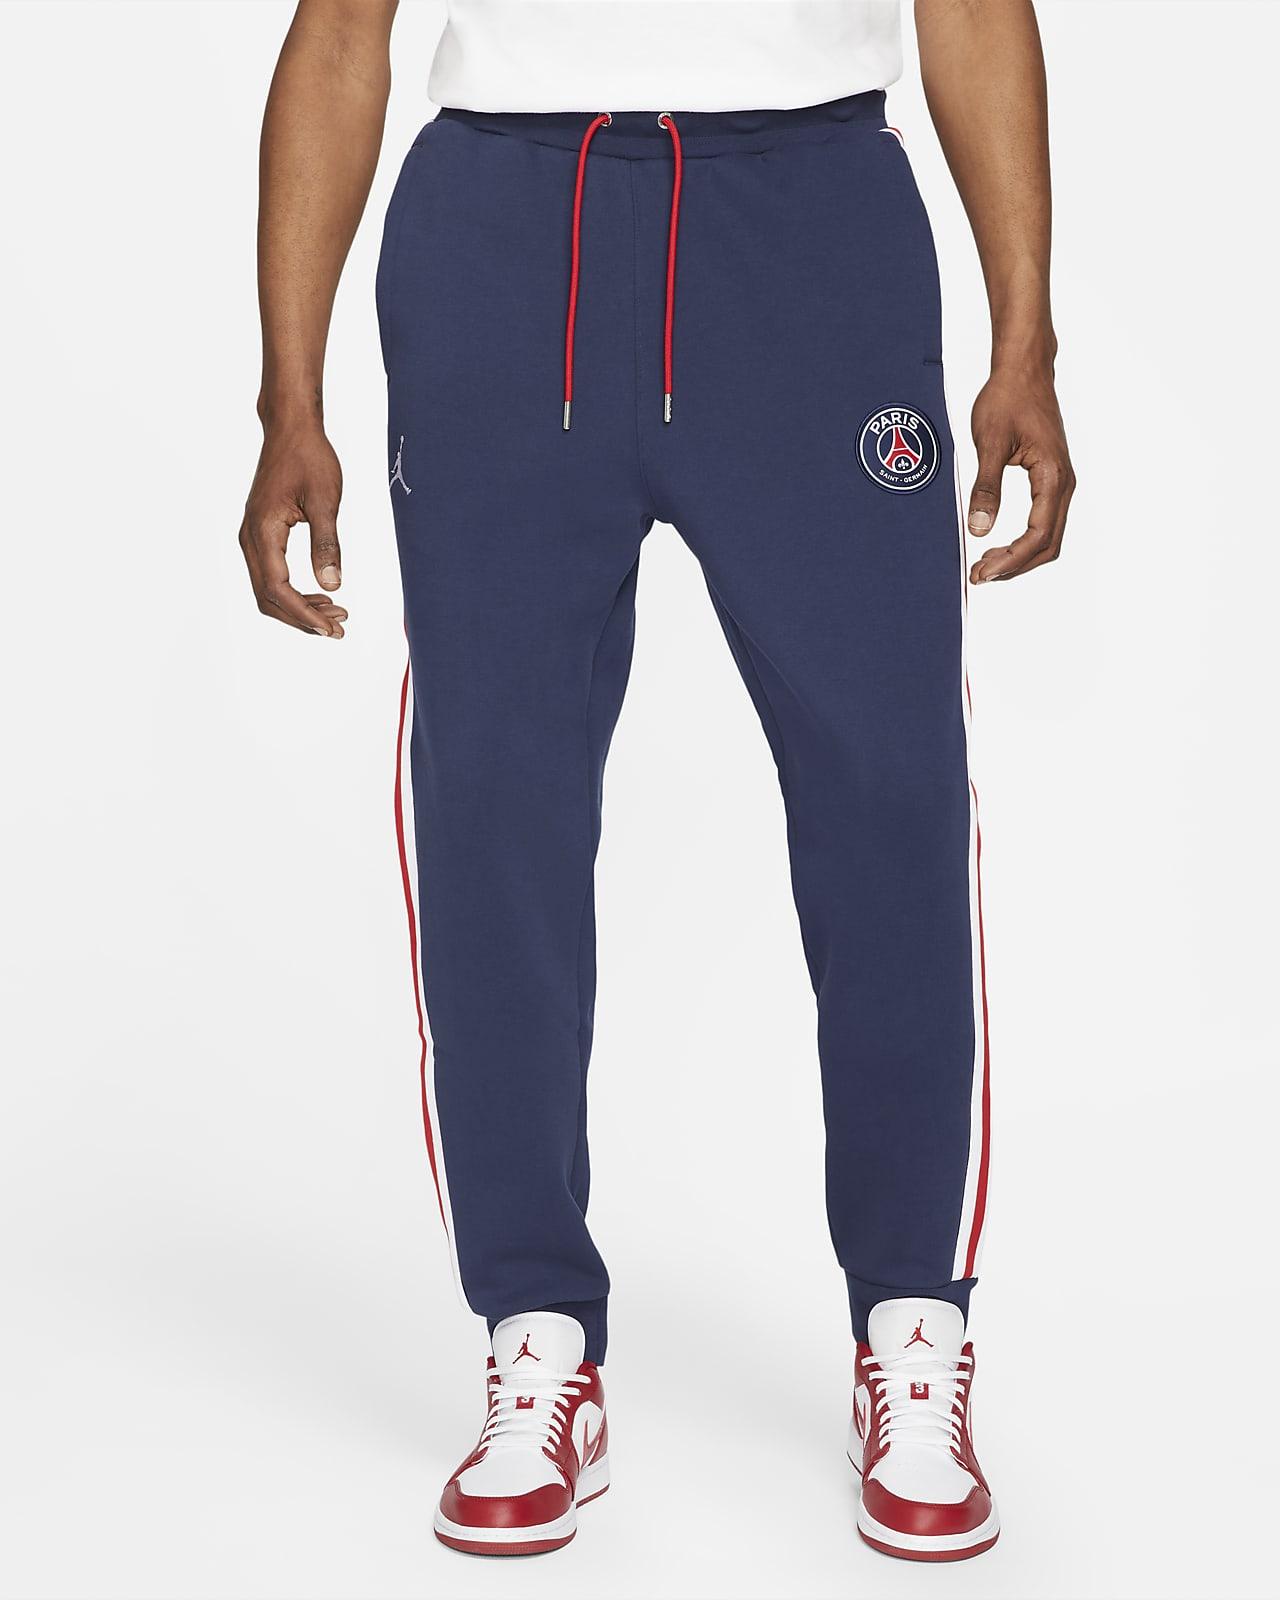 Paris Saint-Germain Men's Fleece Pants